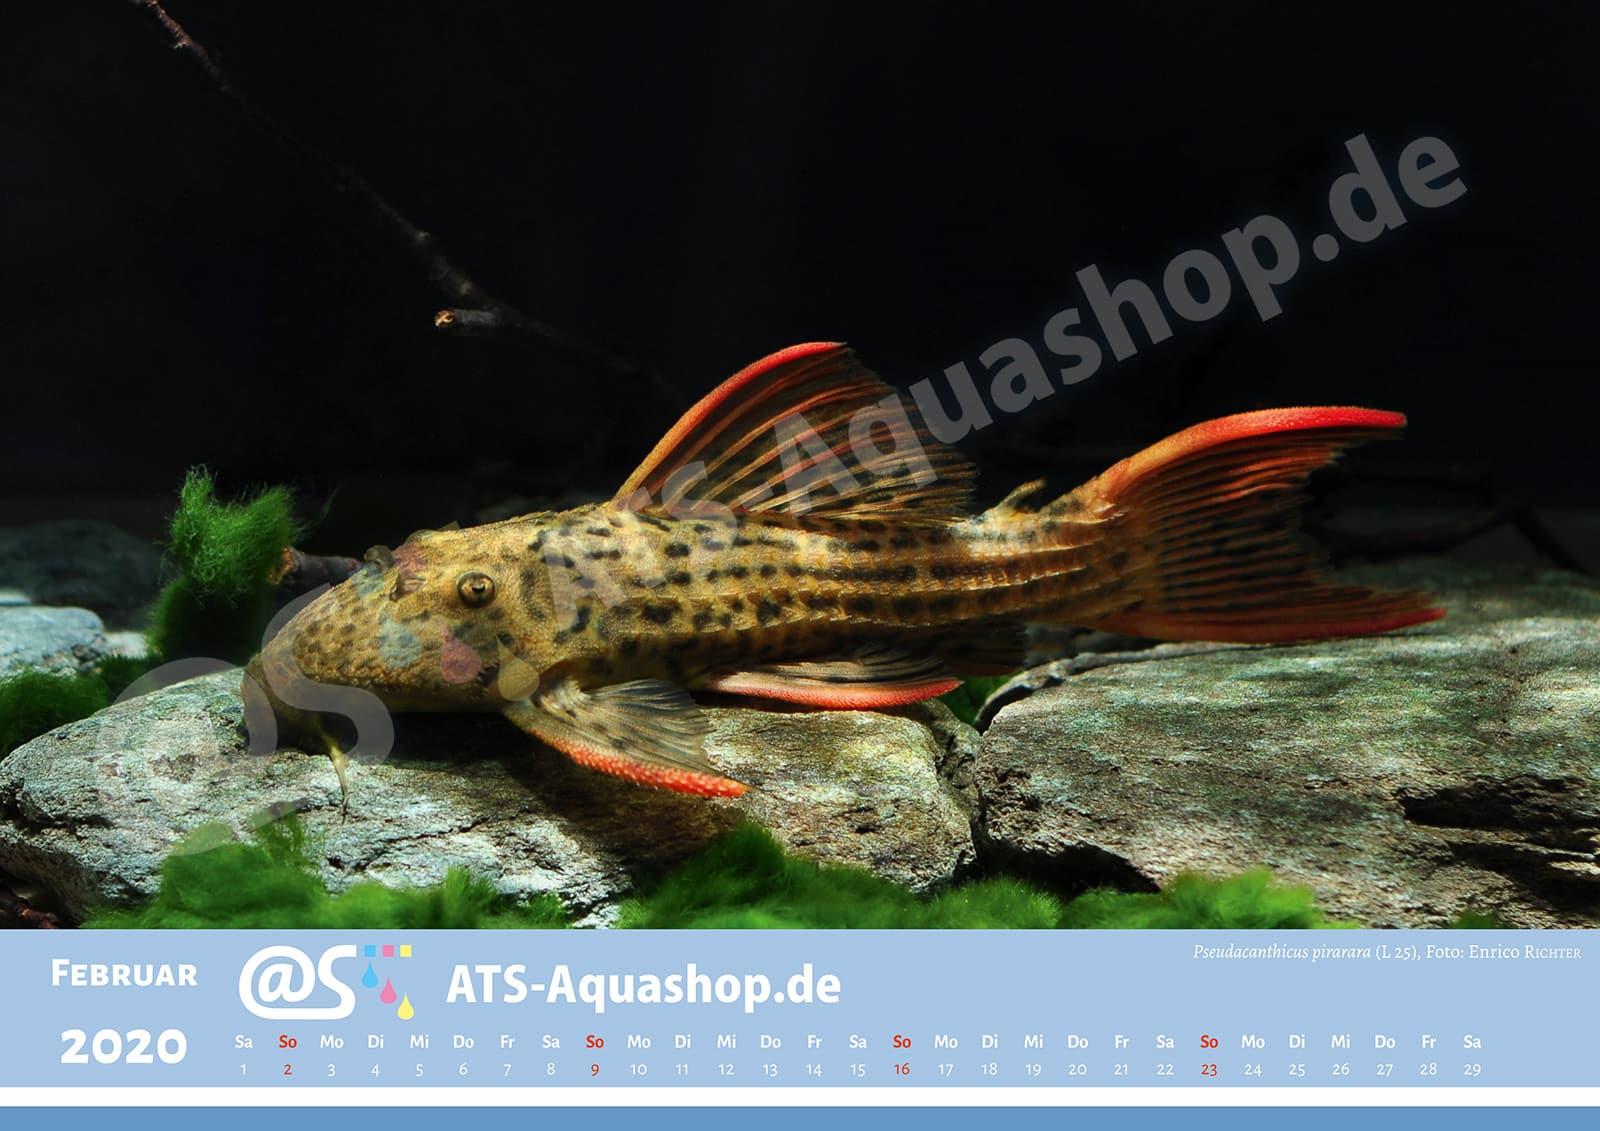 Foto Jahreskalender 2020 DIN A3: Pseudacanthicus pirarara (L 25)